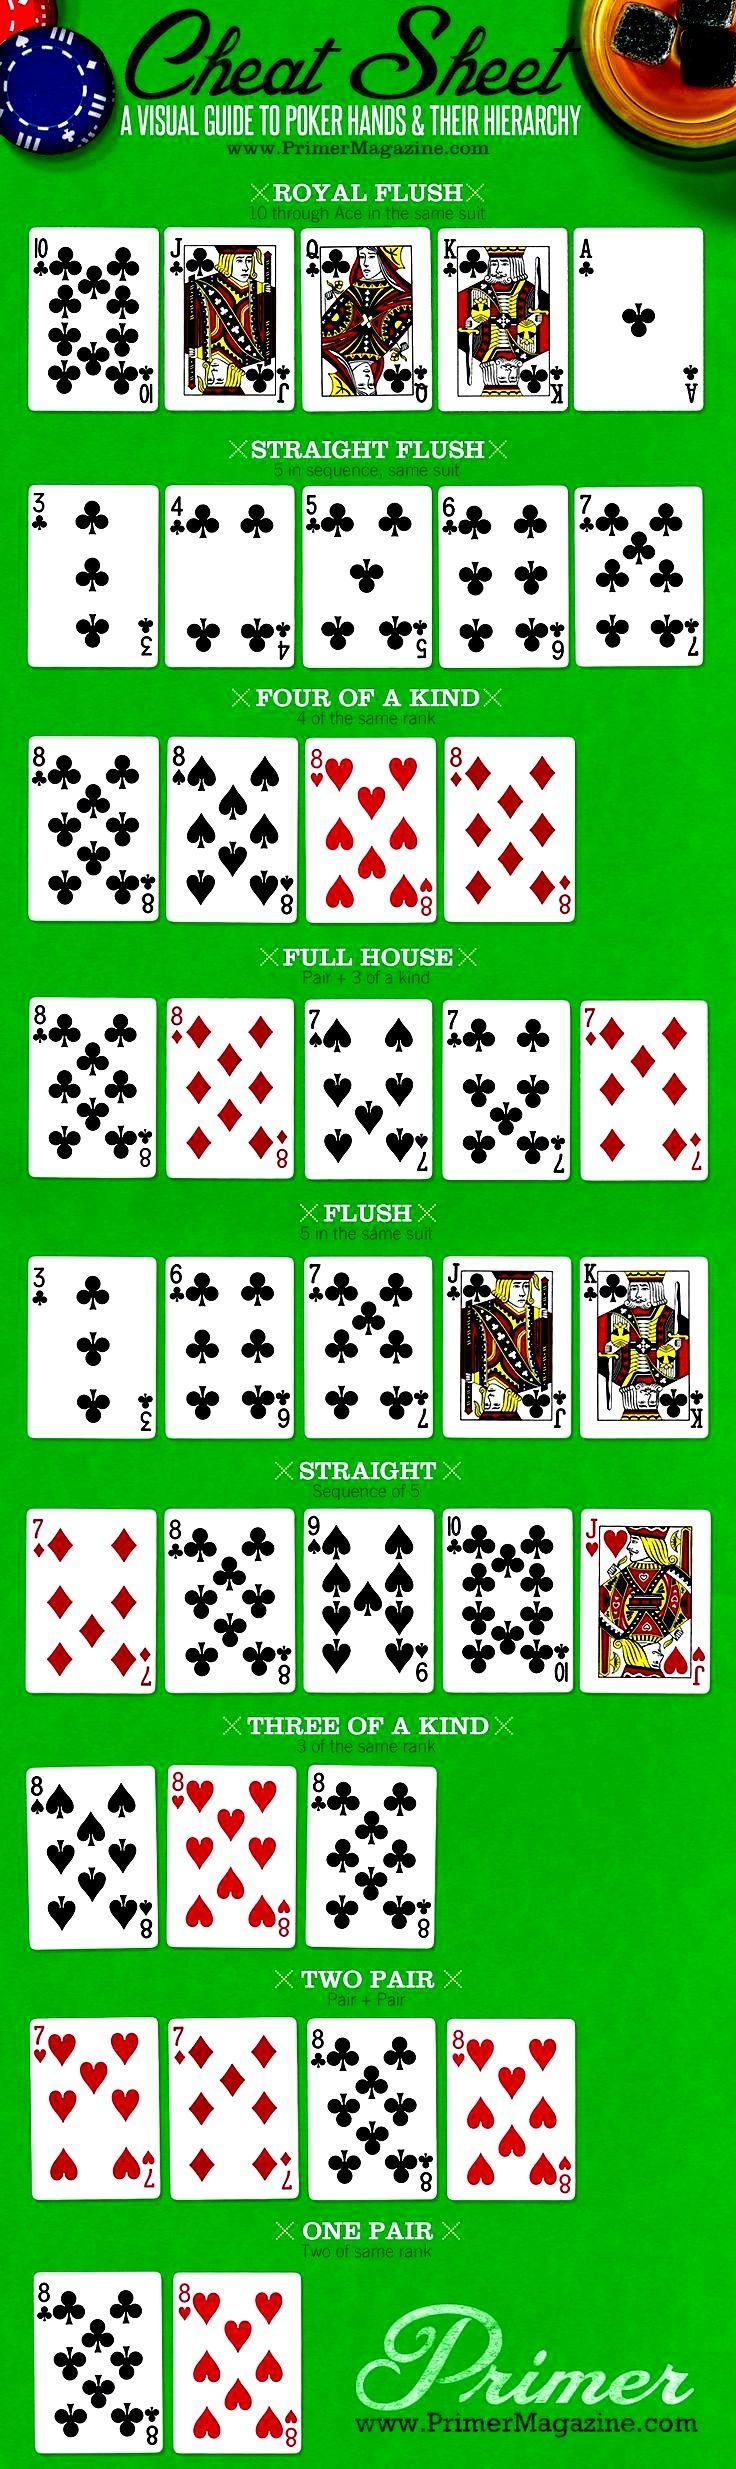 8476710af6e57ecfc38ba2e95c59661c poker online poker party